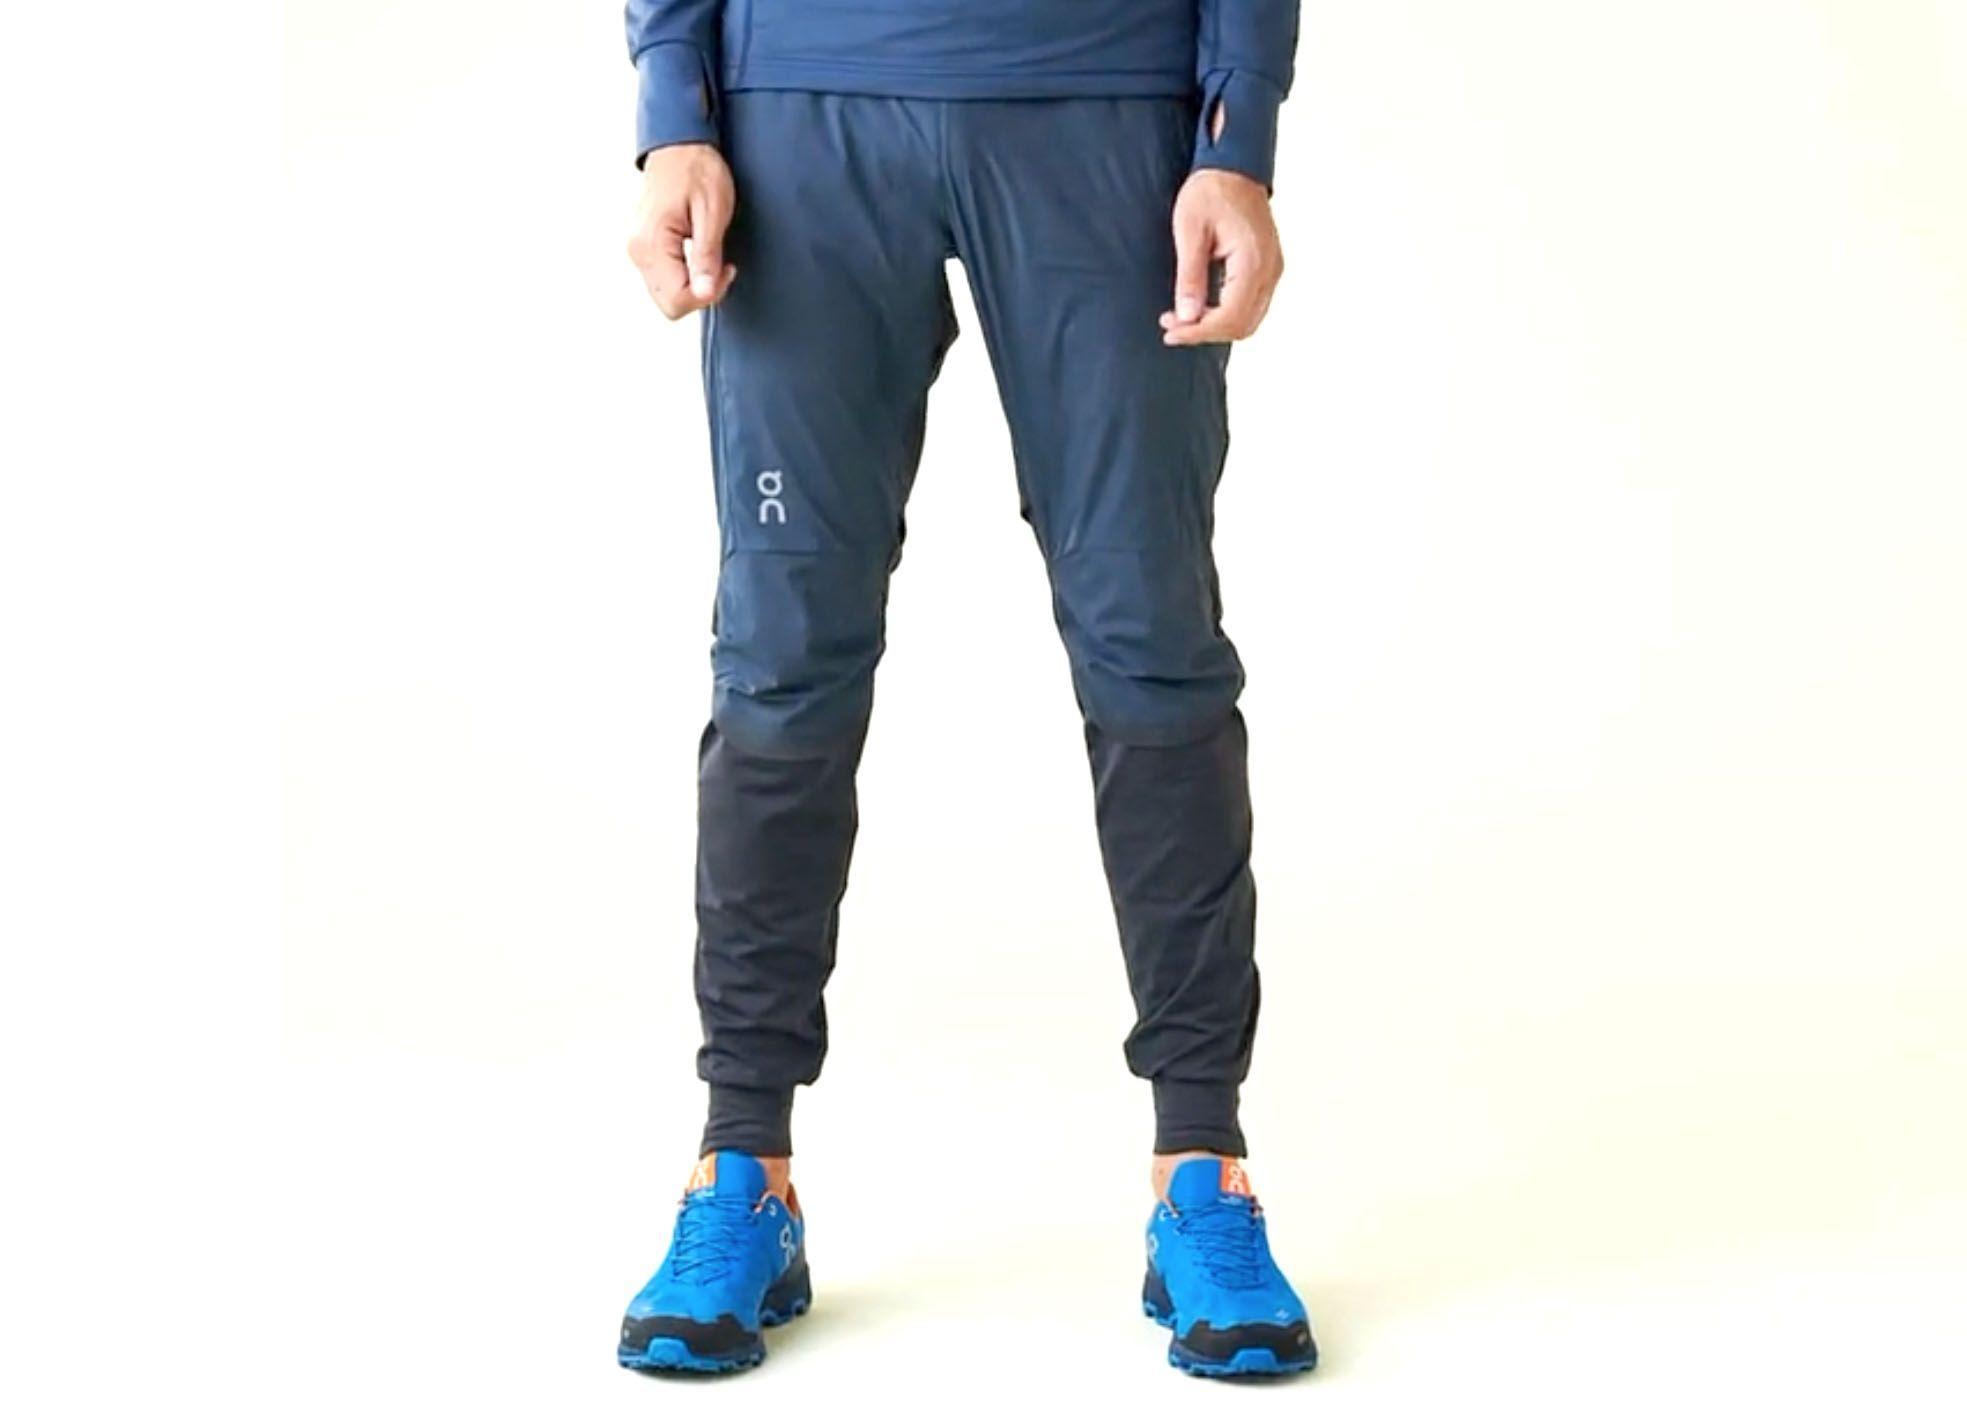 0446f354794e5 Best Running Leggings - Workout Pants 2019